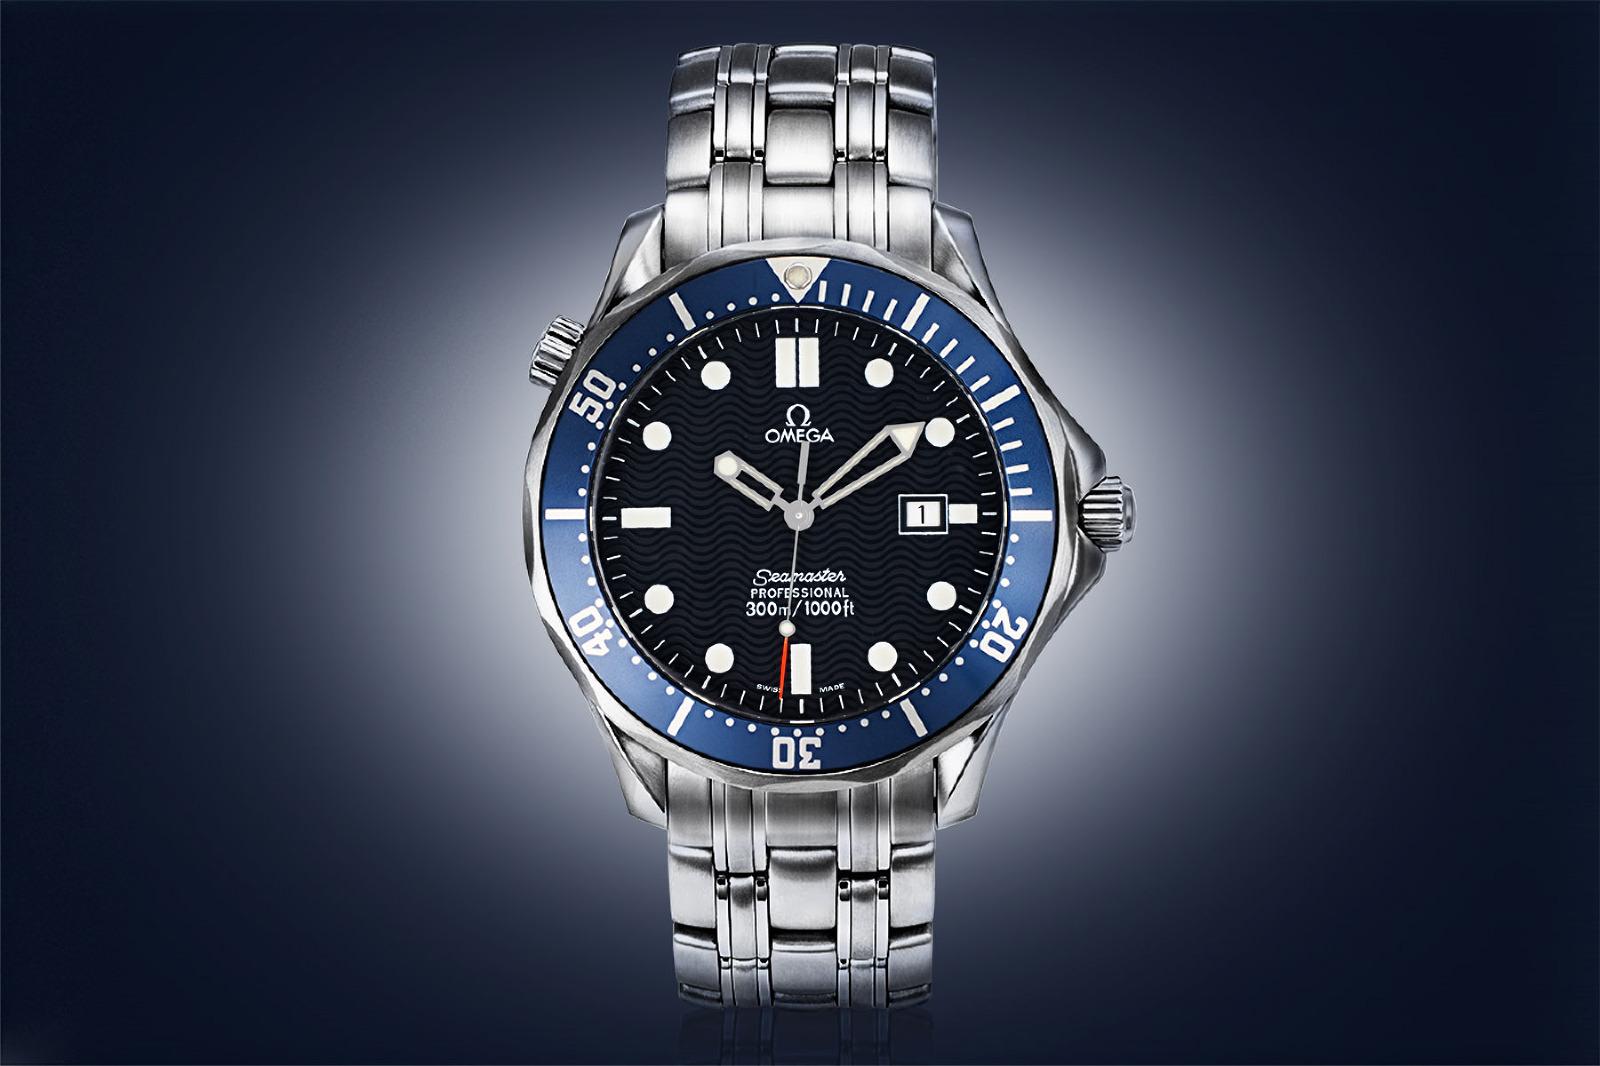 Watch photograph Omega Seamaster 300M